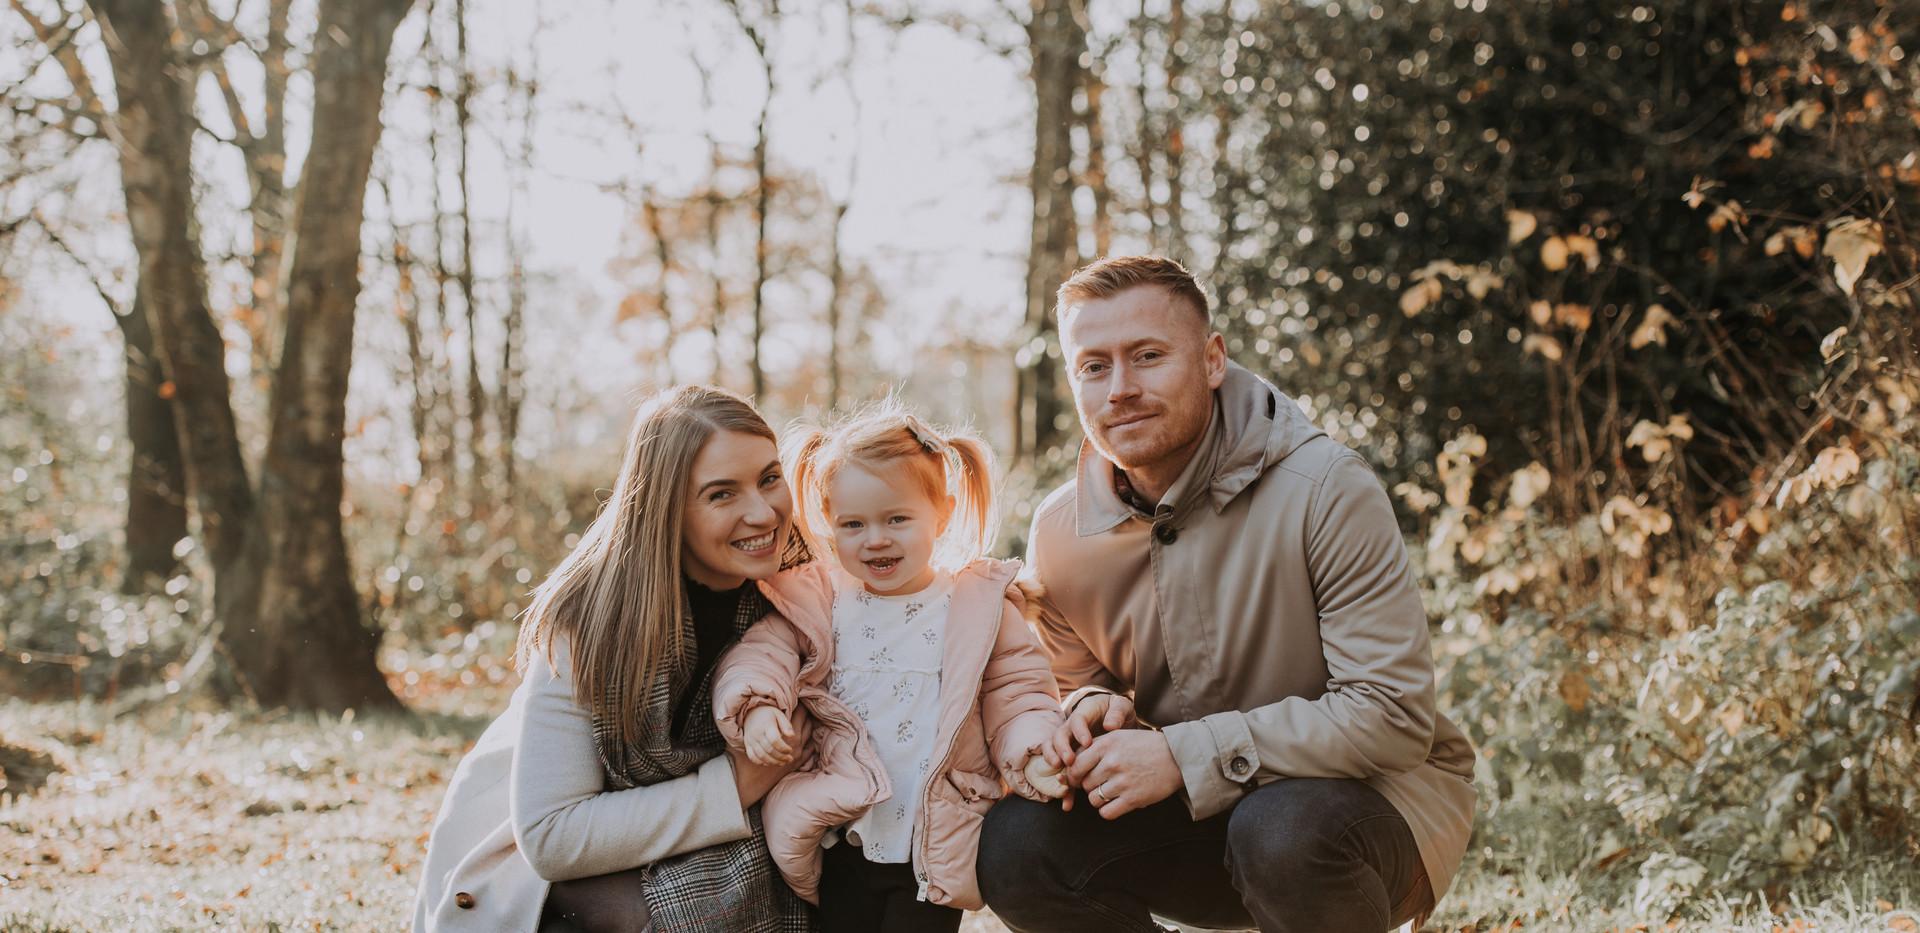 Family photo shoot in Cumrbia